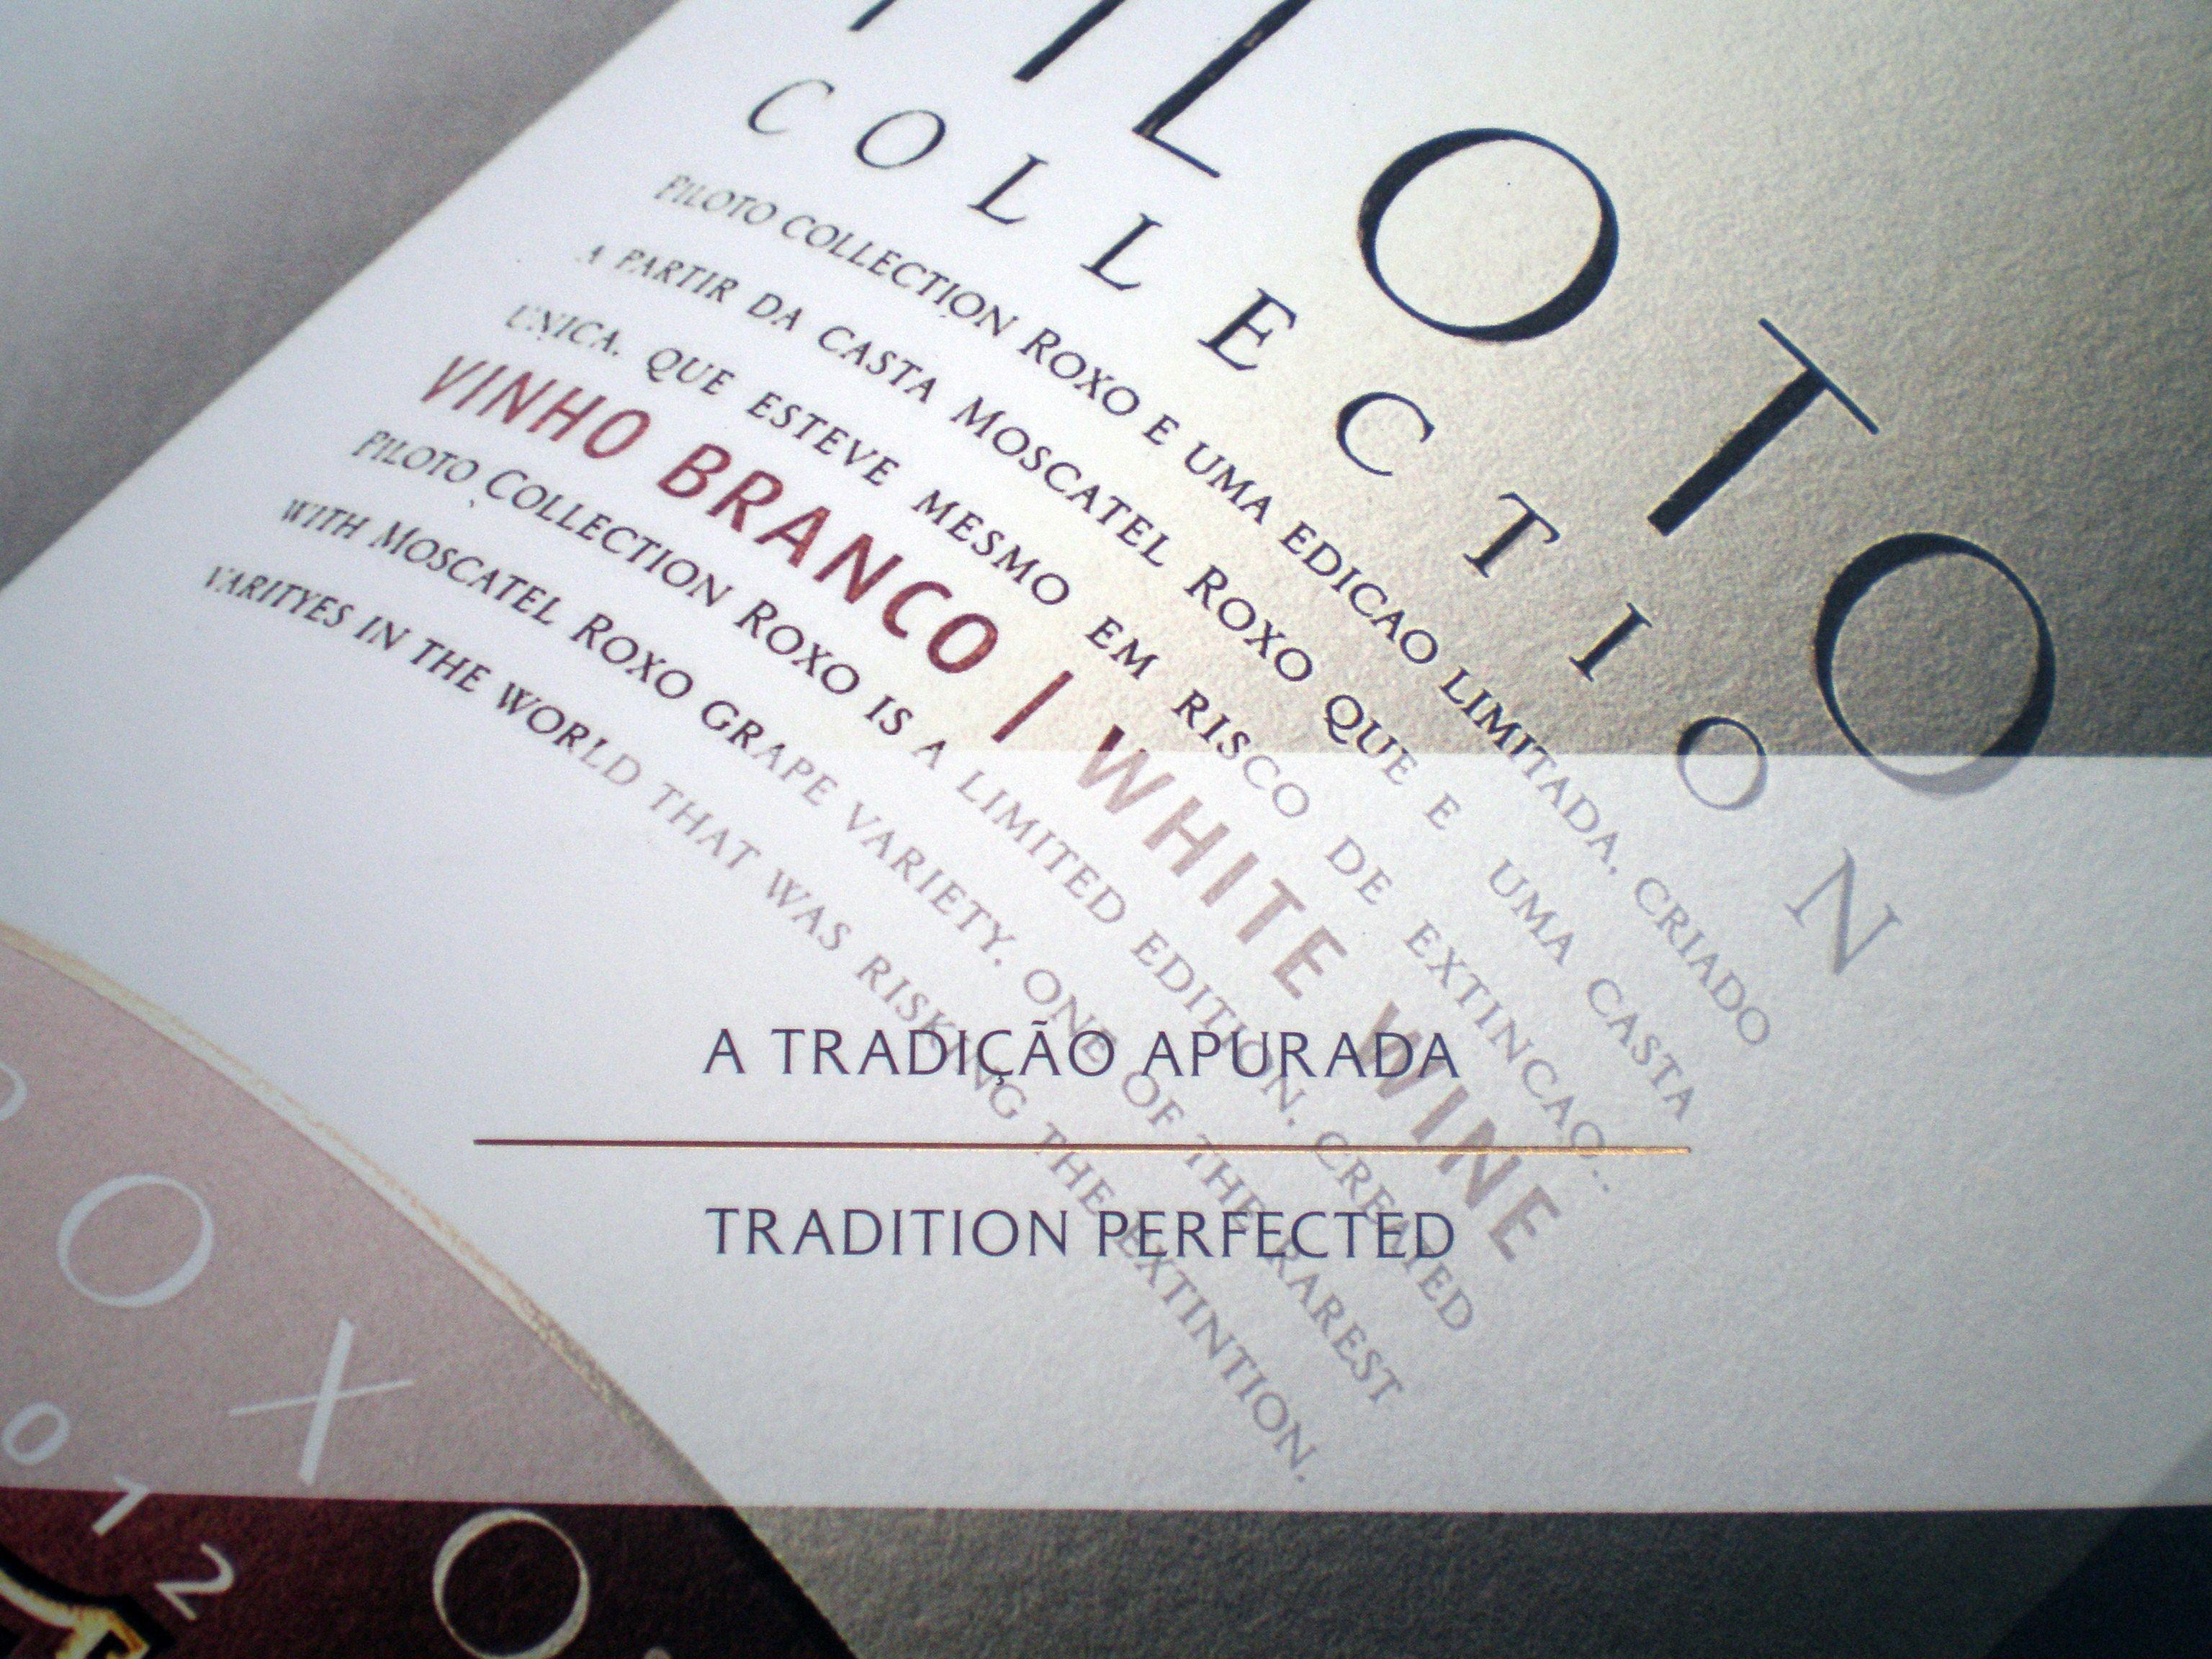 Quinta do Piloto Tradition Perfected